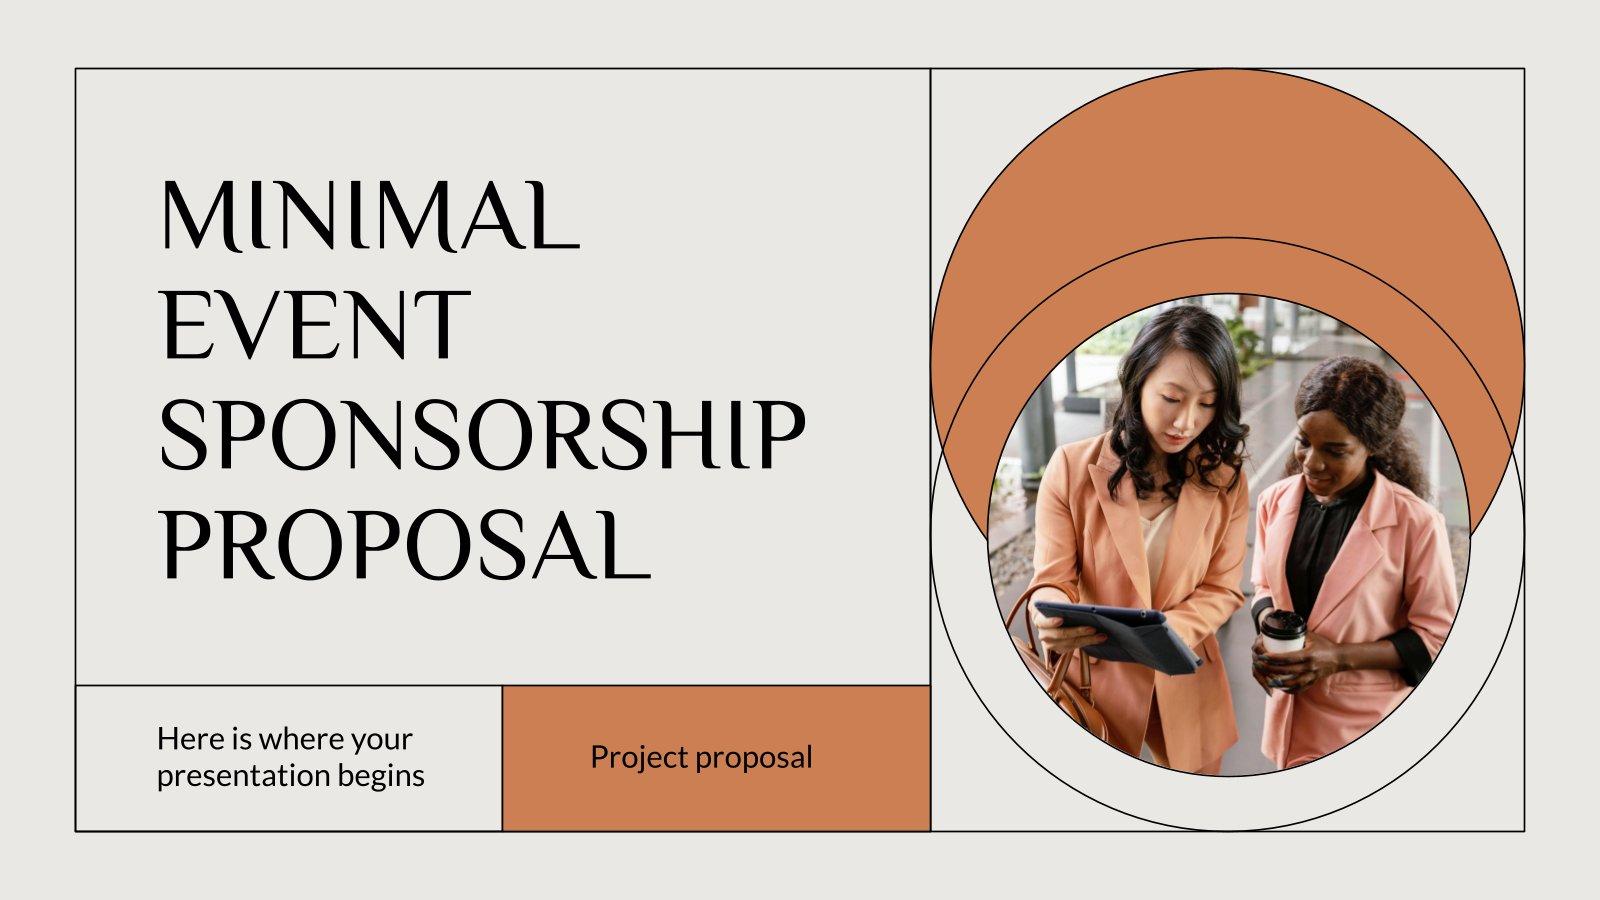 Minimal Event Sponsorship Proposal presentation template